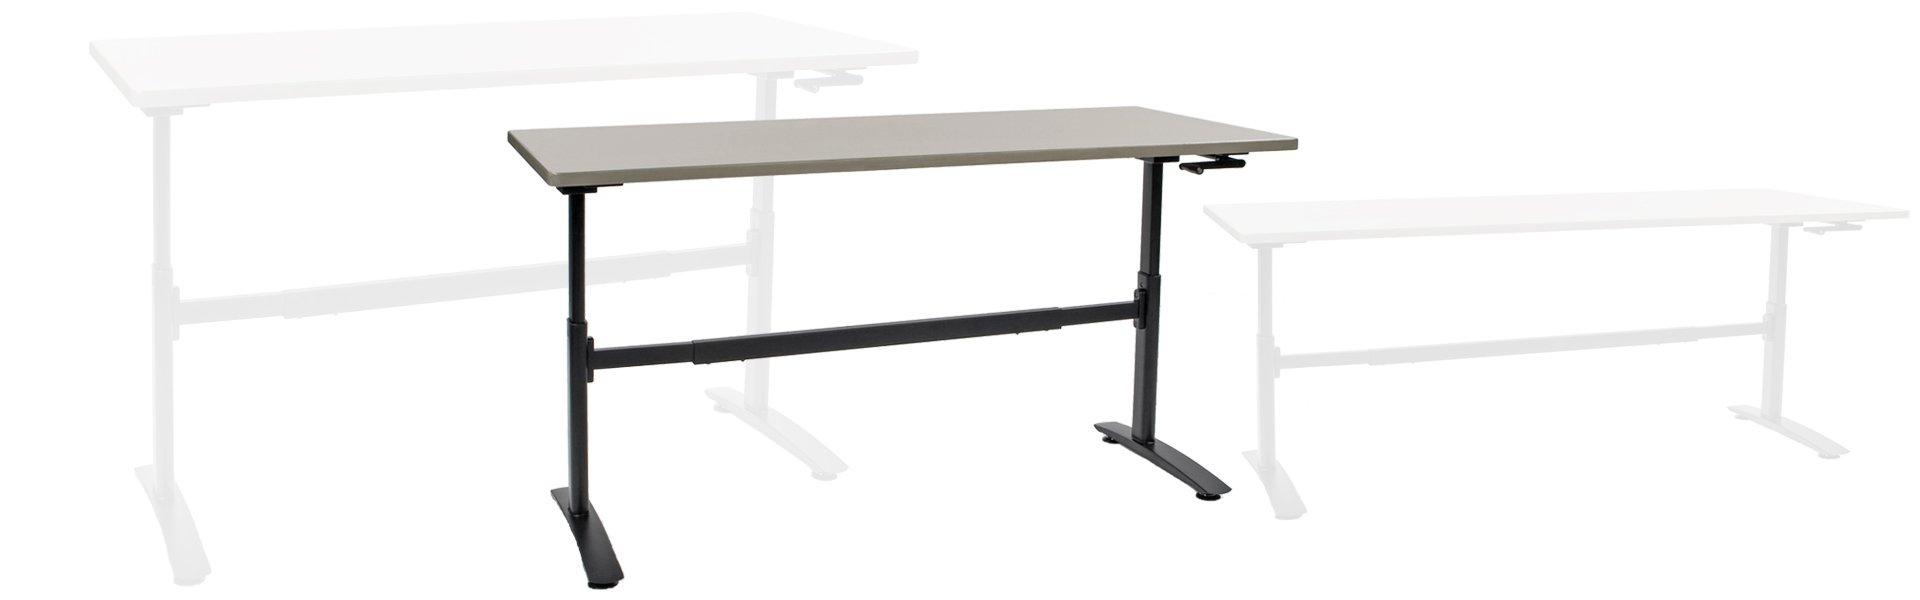 Corilam 640 Adjustable Height Desk